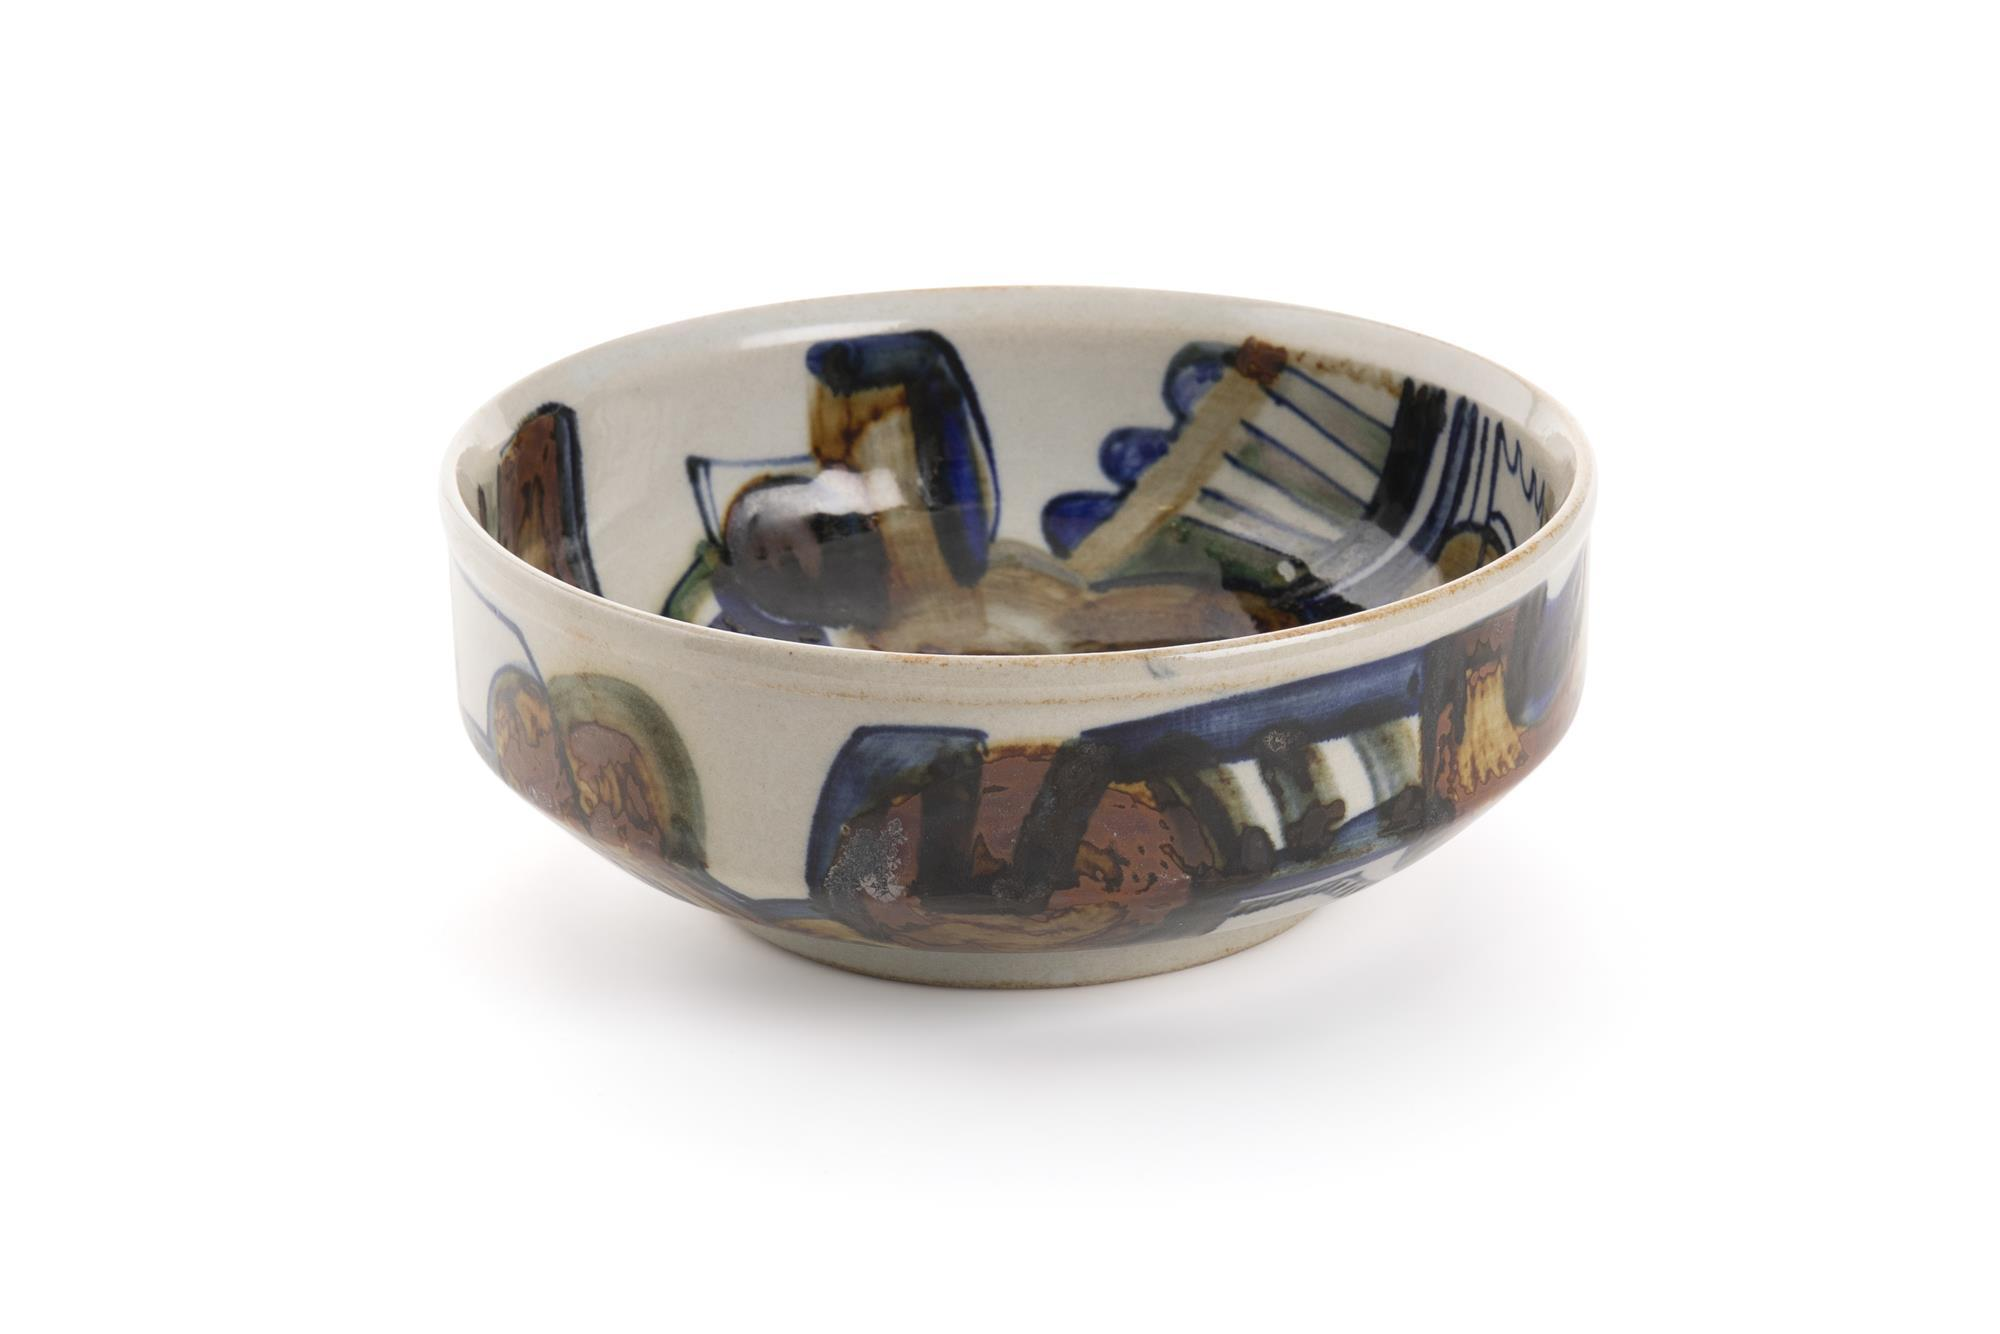 "Jim Kaneko, (1923-1999, American), Low center bowl, 1973, Glazed ceramic, 3"" H x 7.75"" Dia."